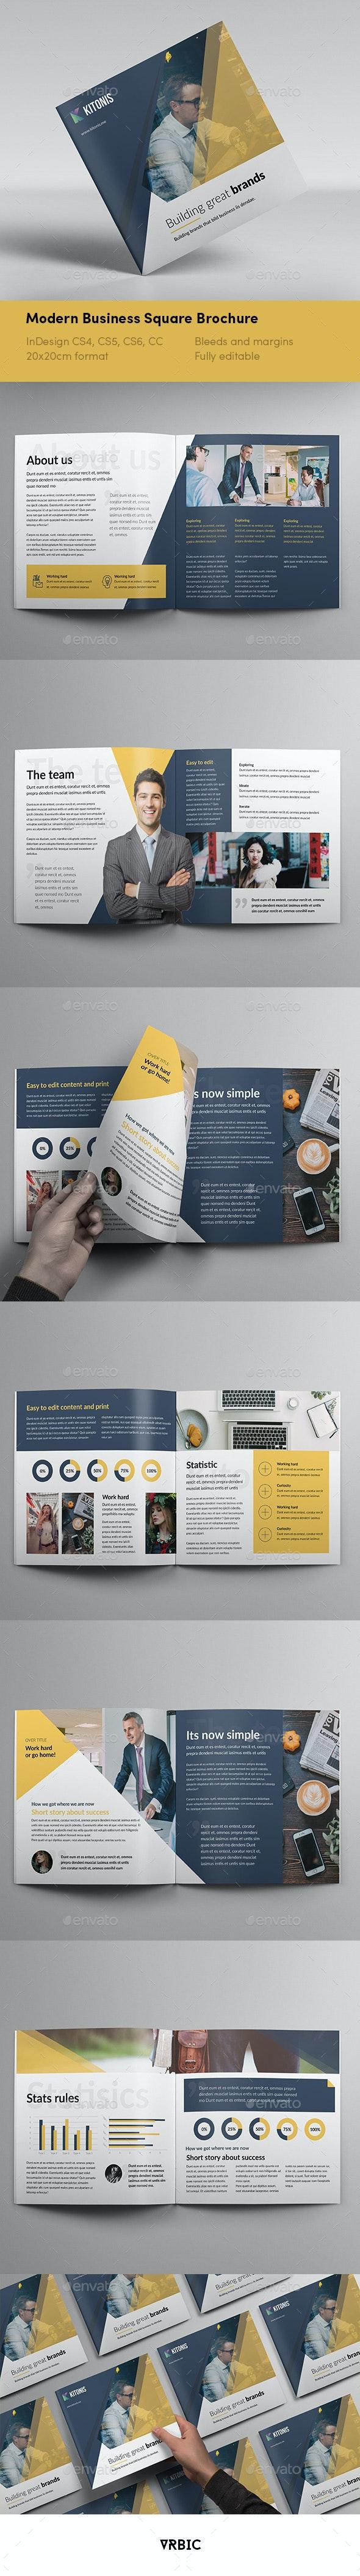 Modern Business Square Brochure - Brochures Print Templates